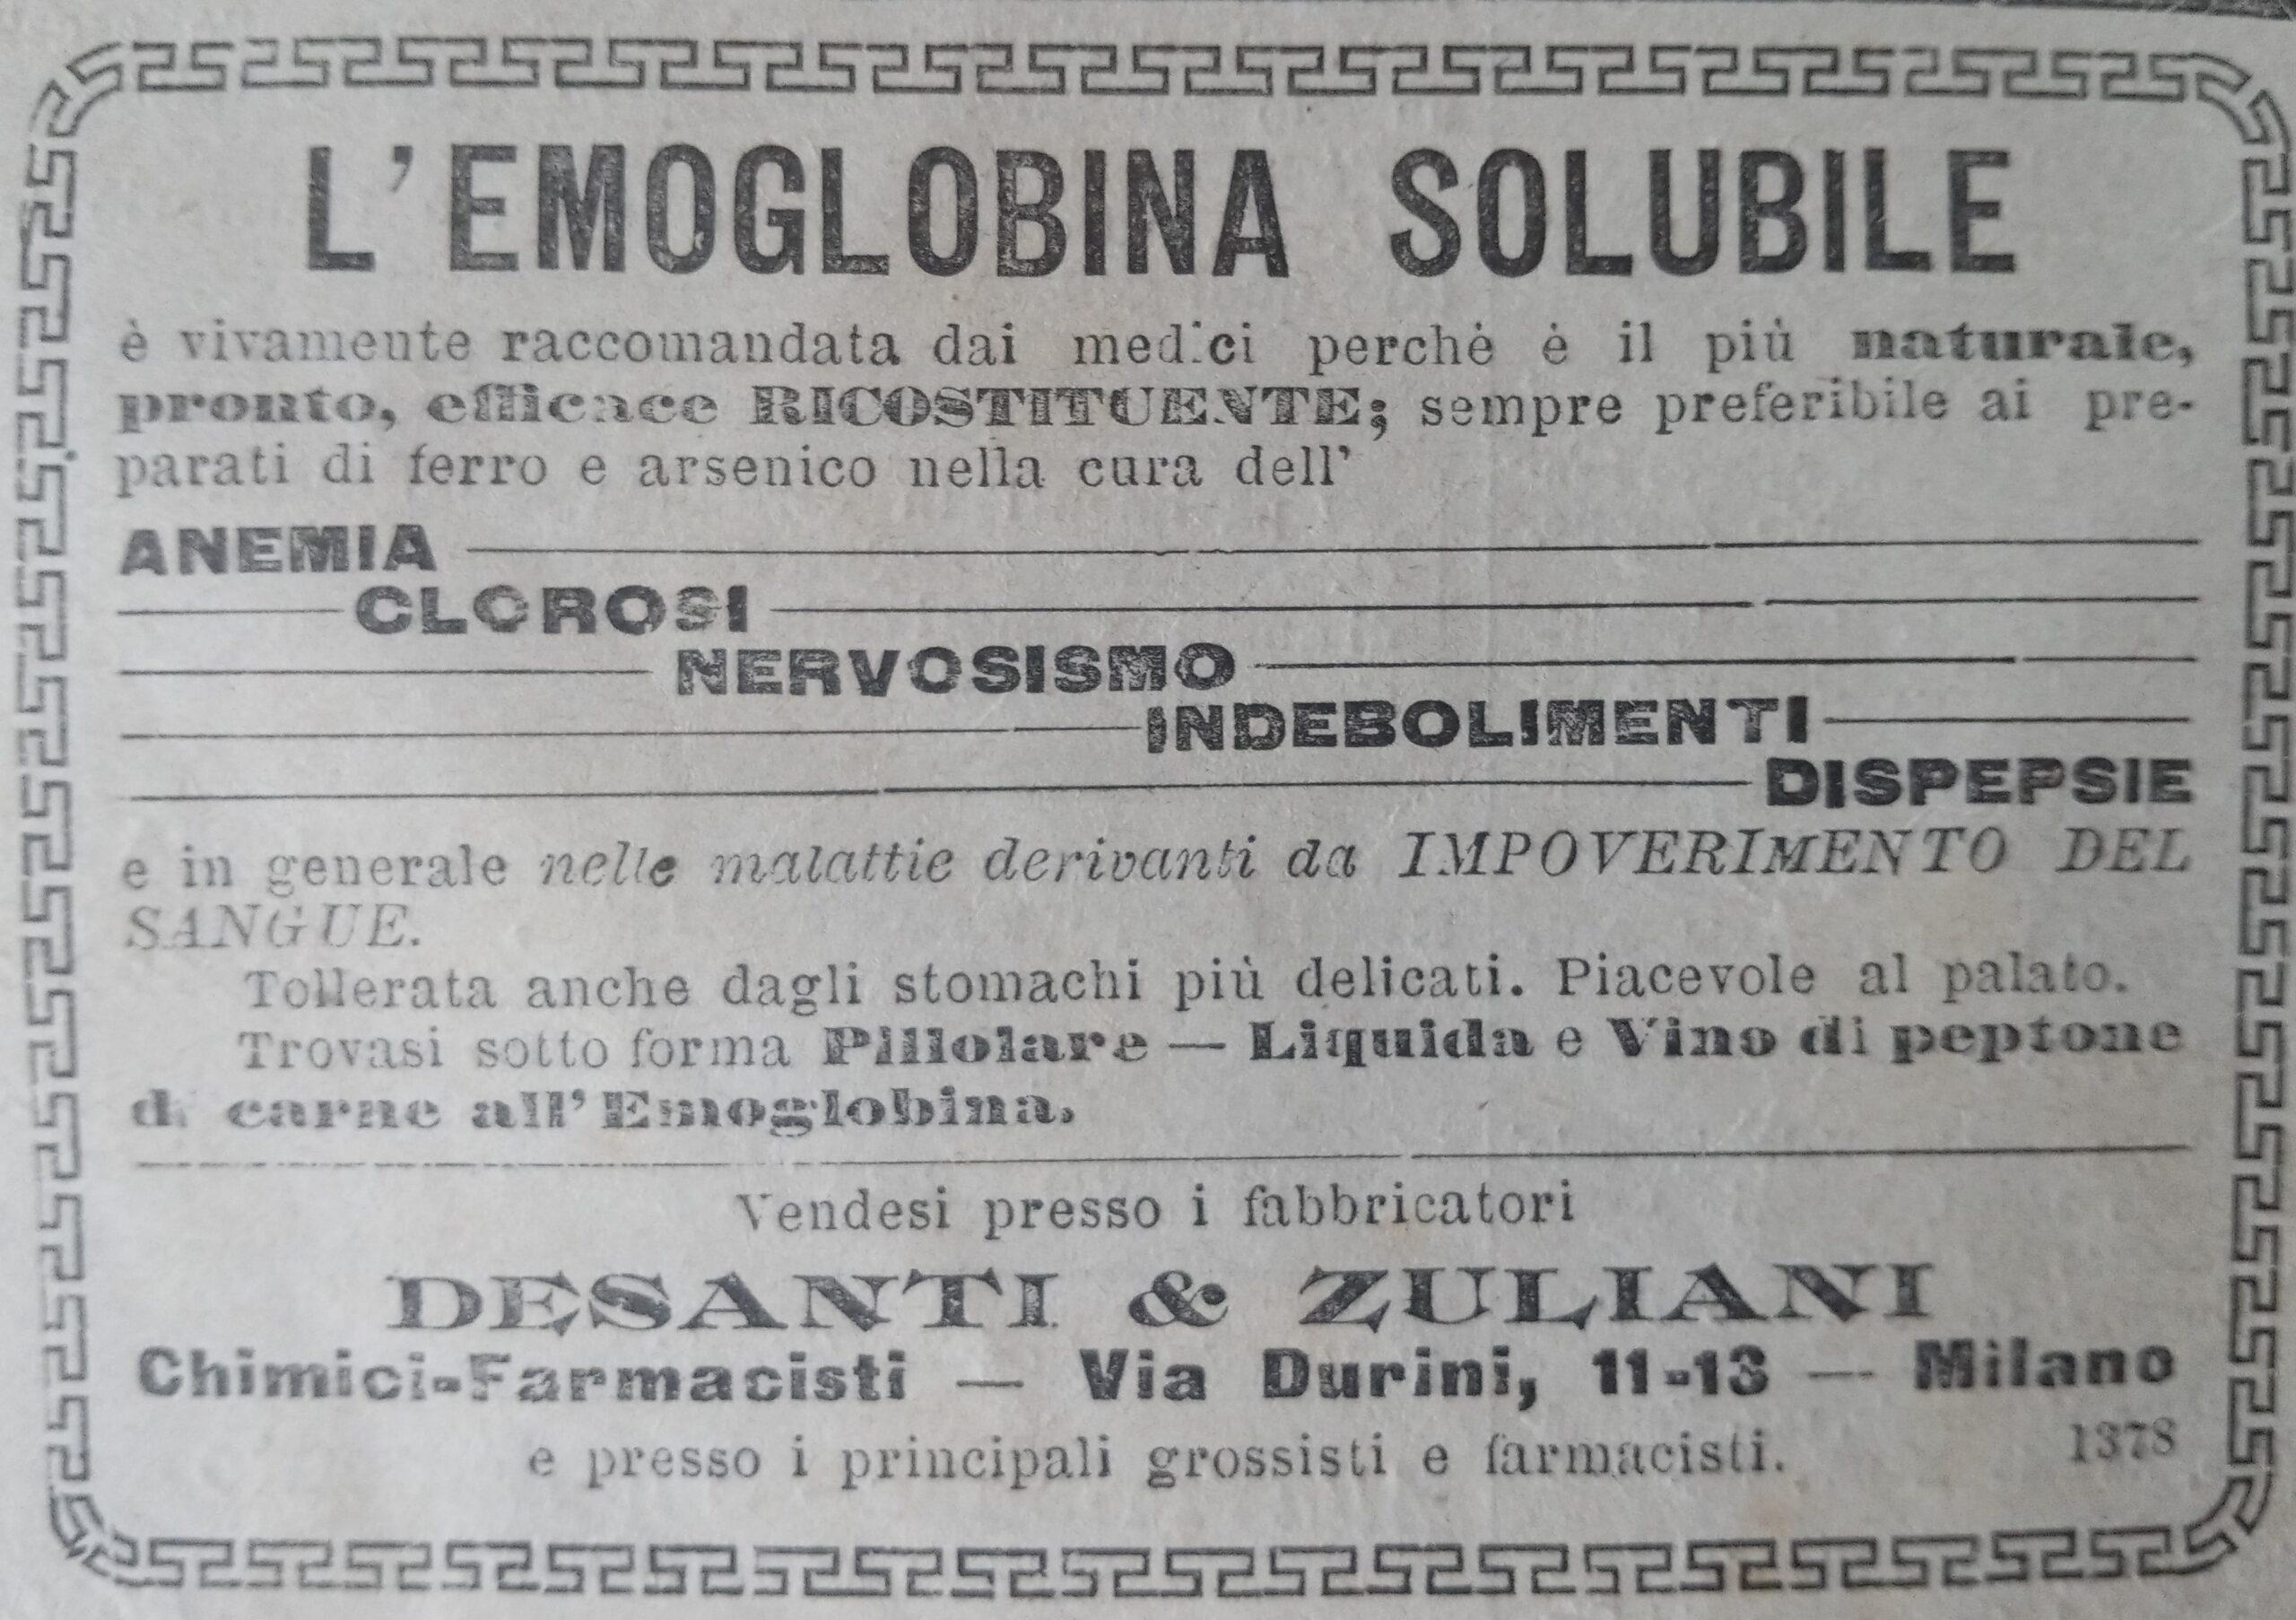 emoglobina solubile desanti & zuliani - pubblicità